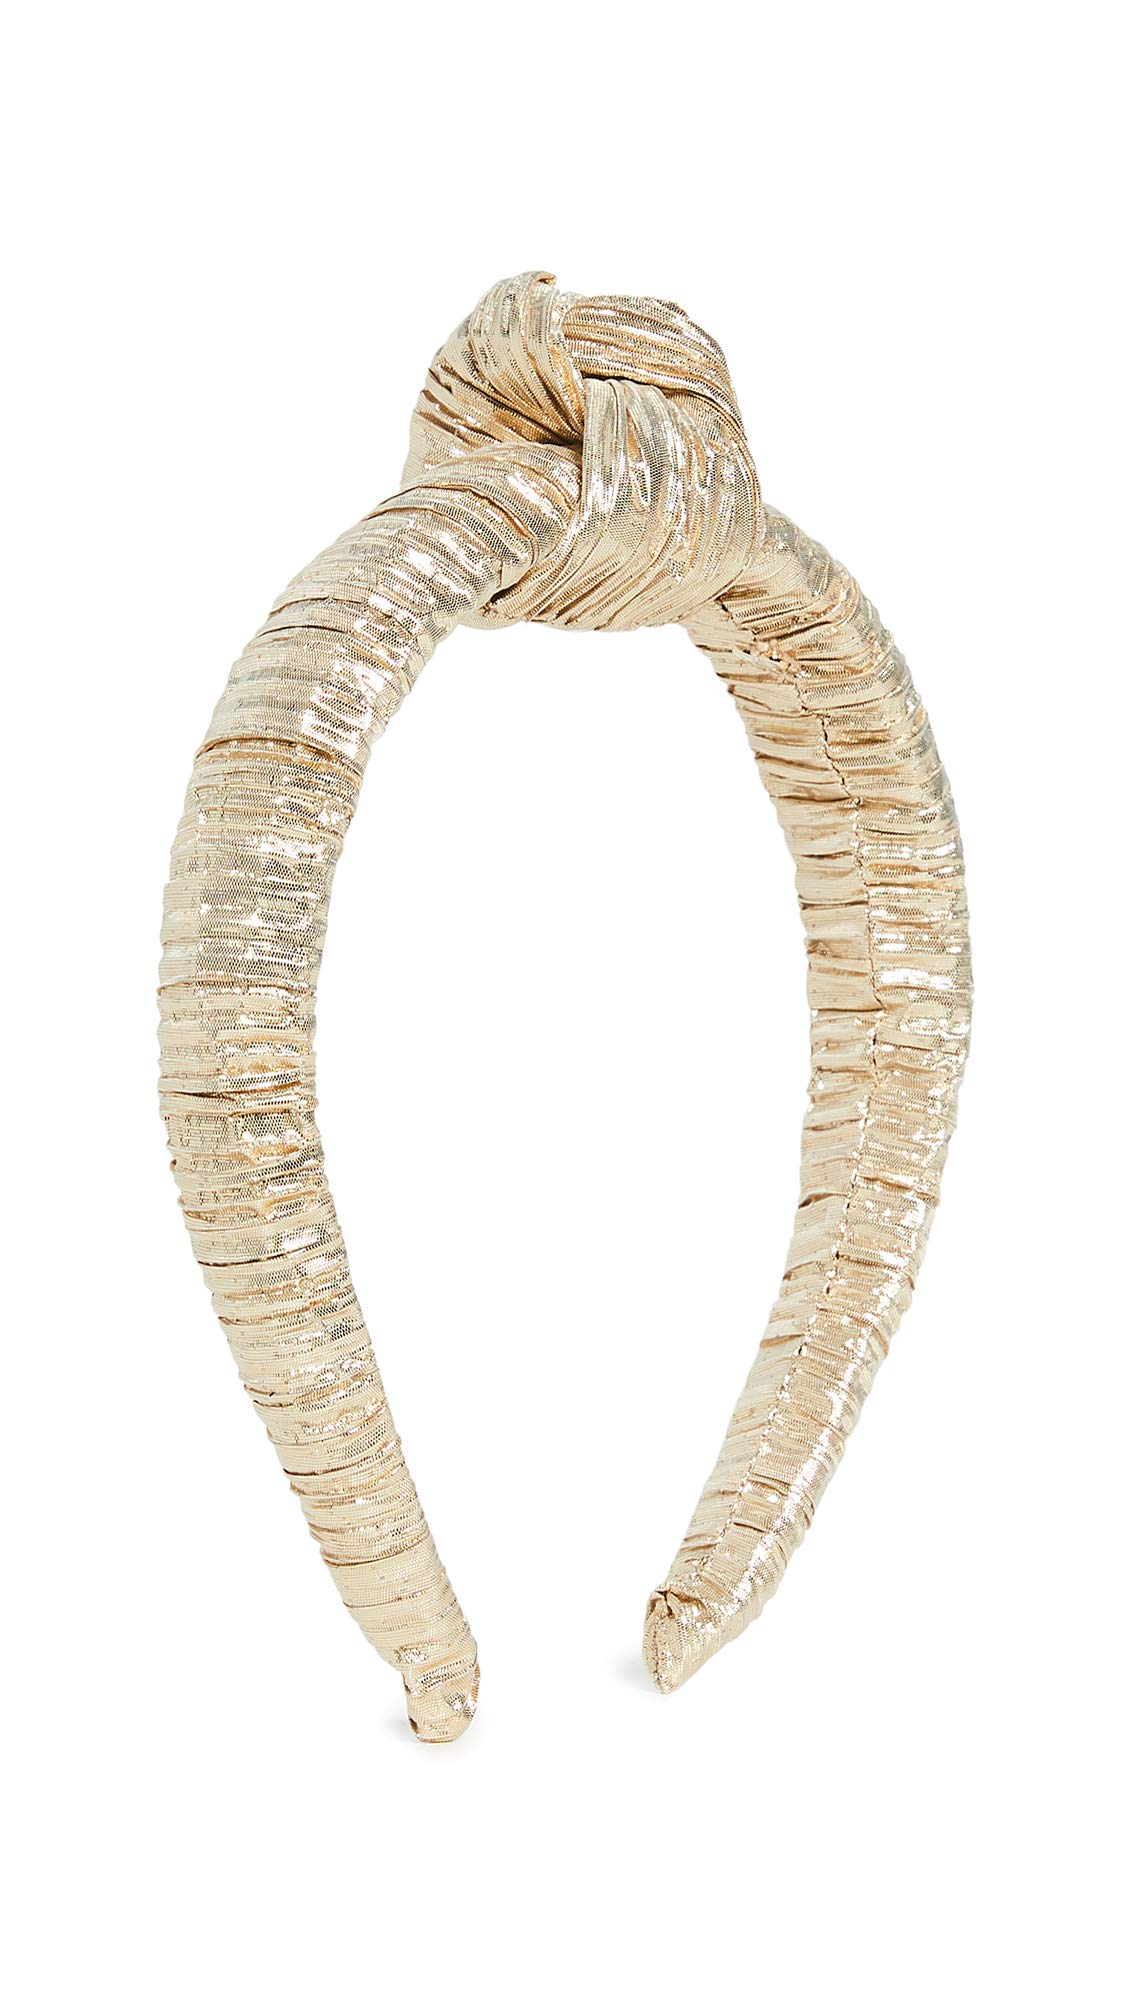 Loeffler Randall Women's Knot Headband, Gold, One Size by Loeffler Randall